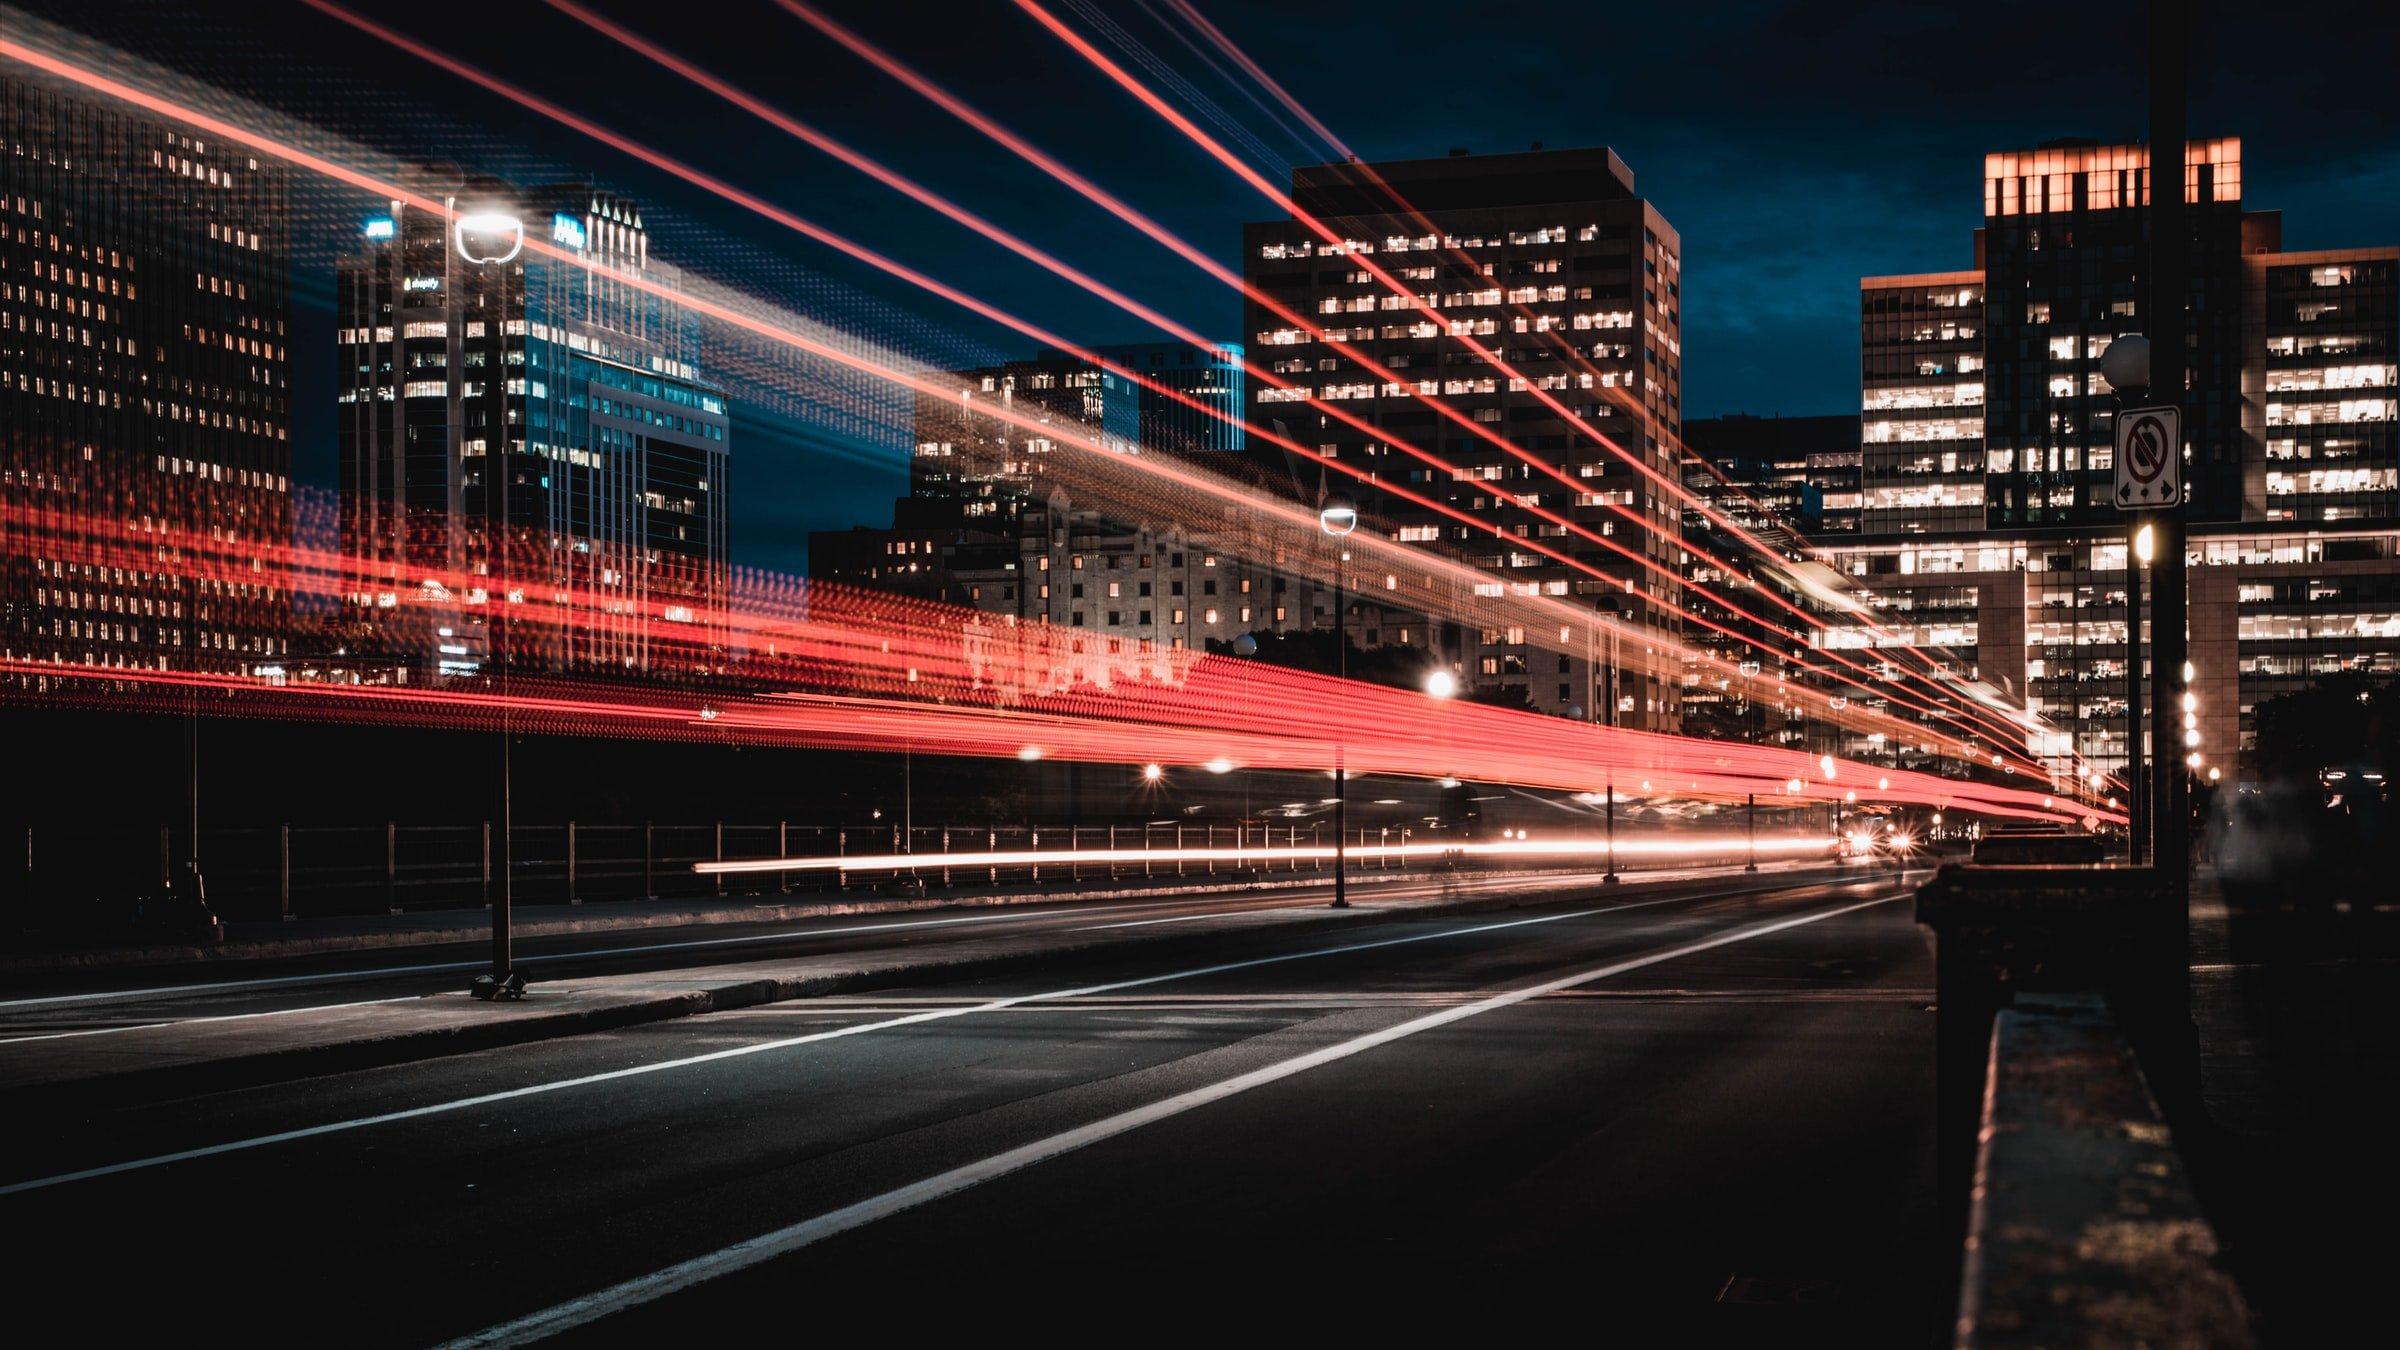 Virgin Media trials Infinera's XR Optics to deliver multi-gigabit speeds